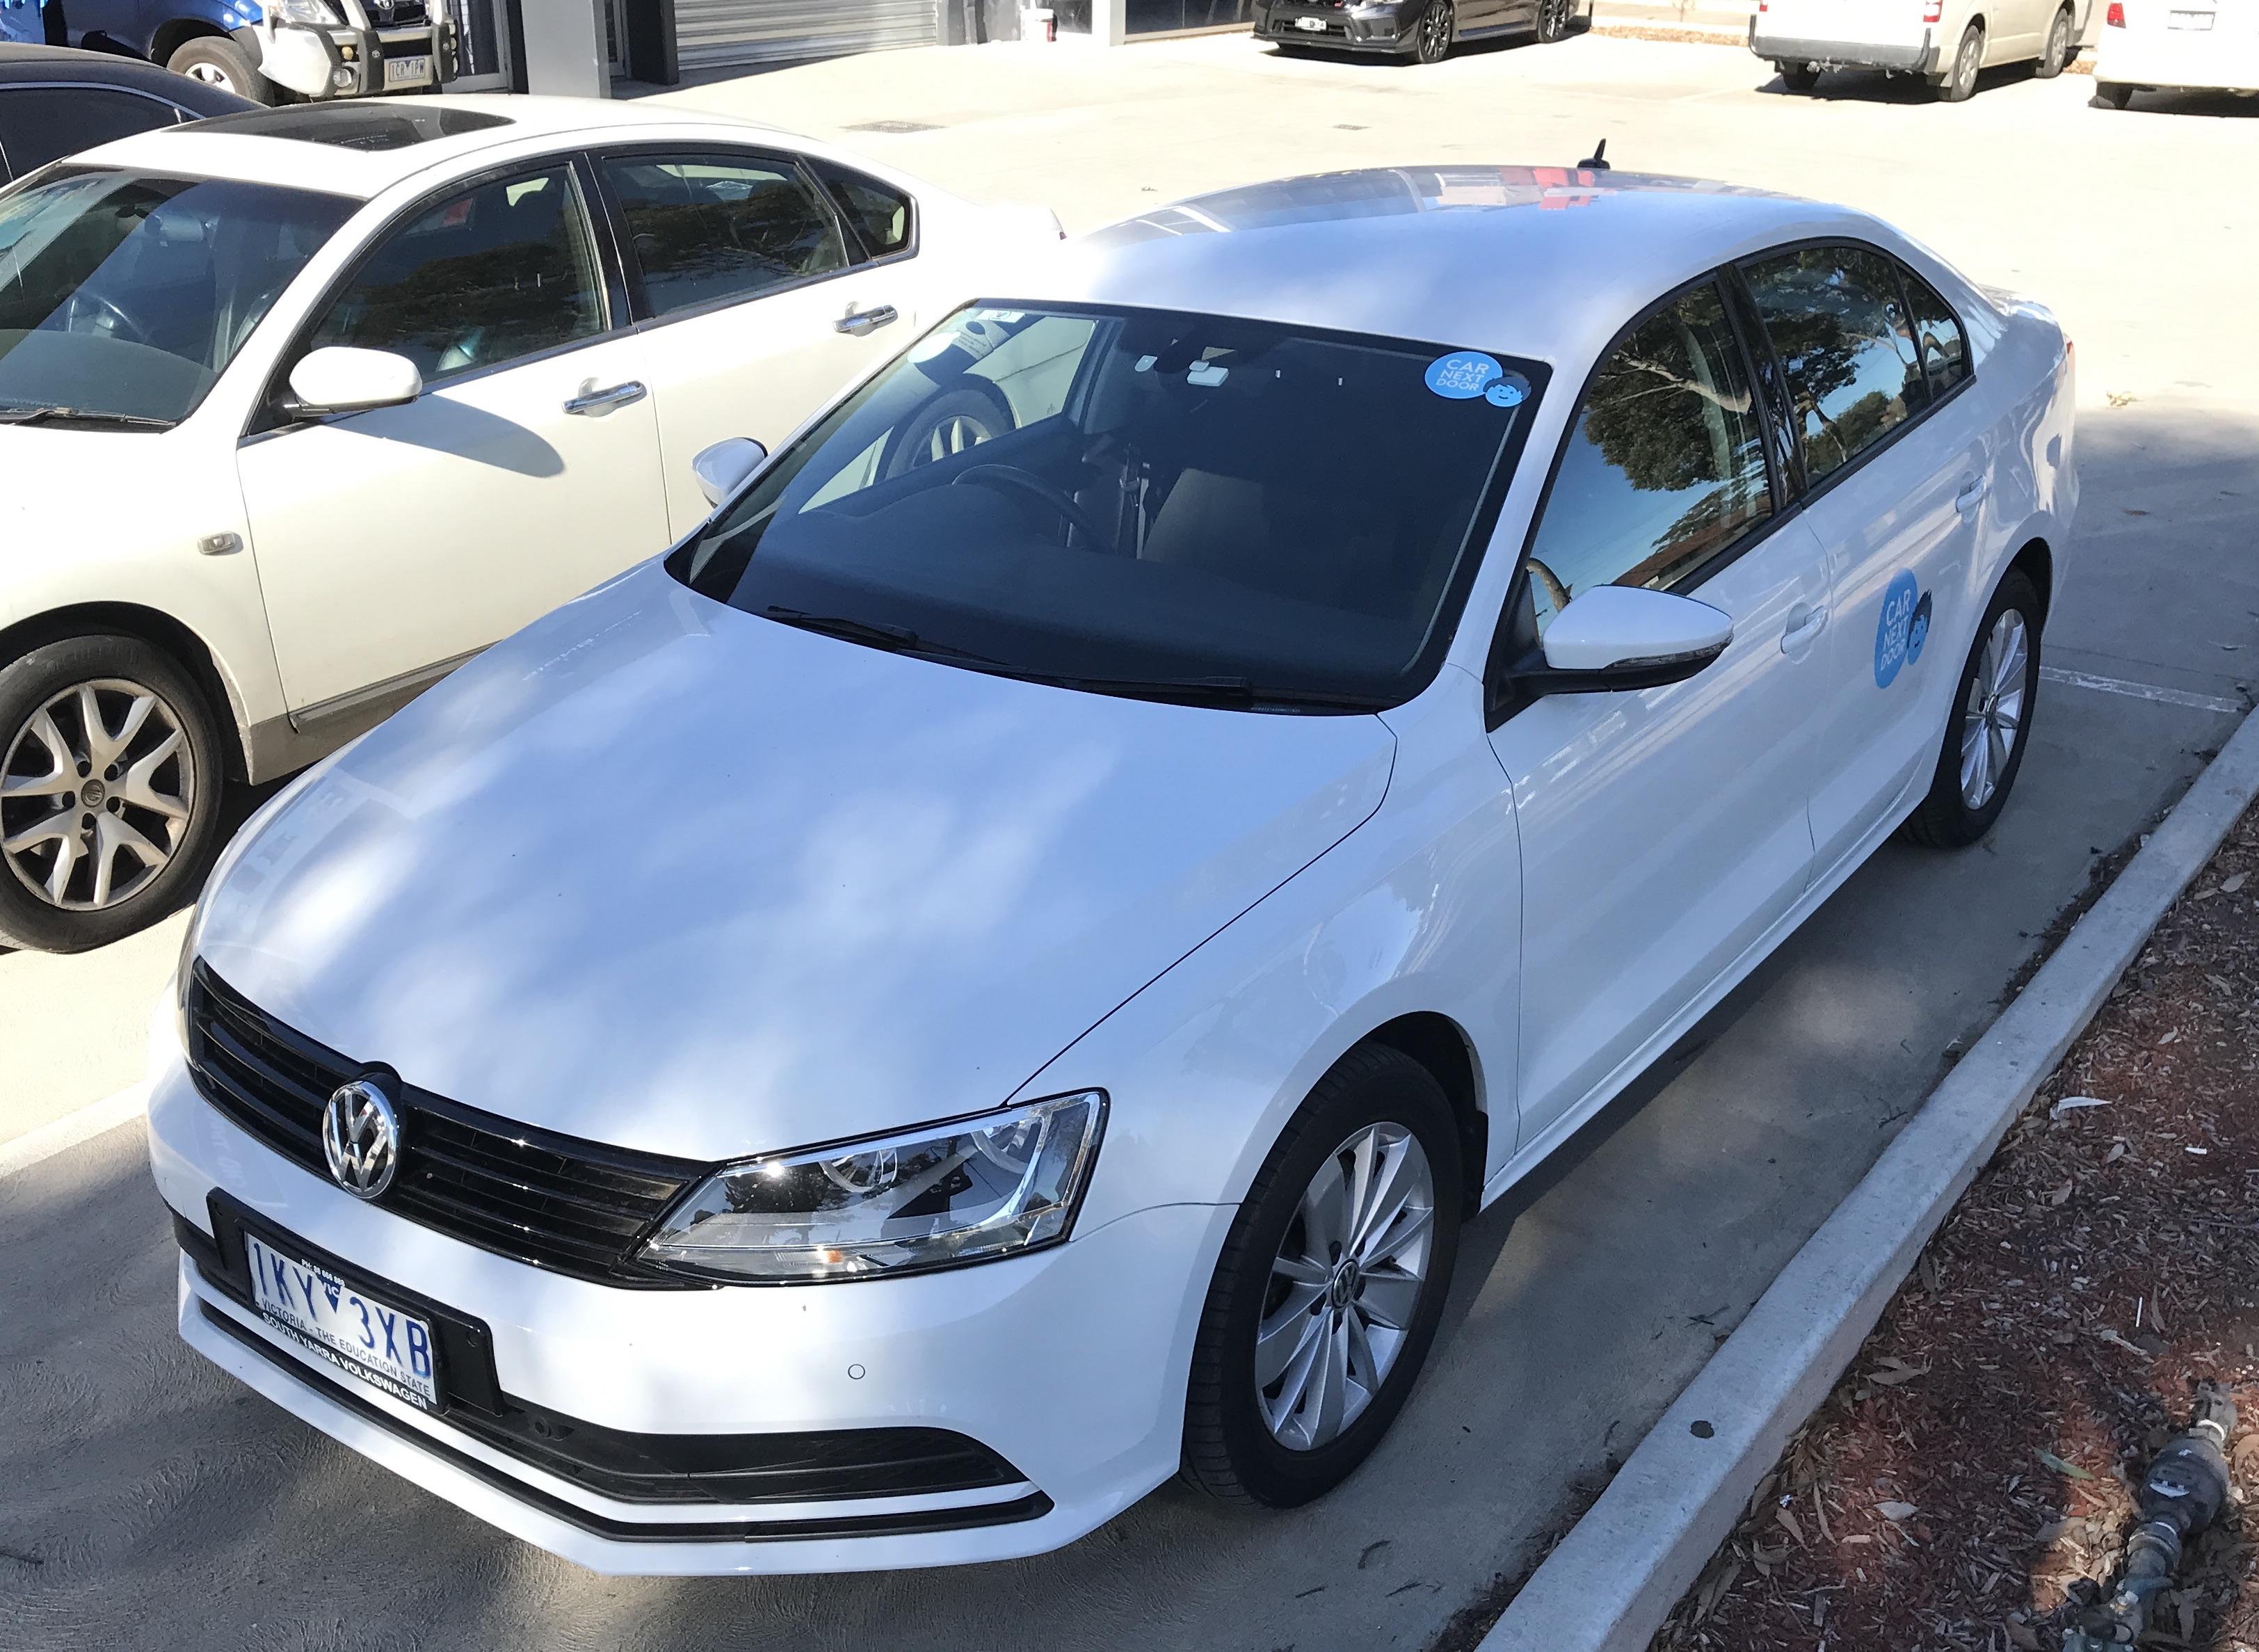 Picture of Shehzad's 2017 Volkswagen Jetta